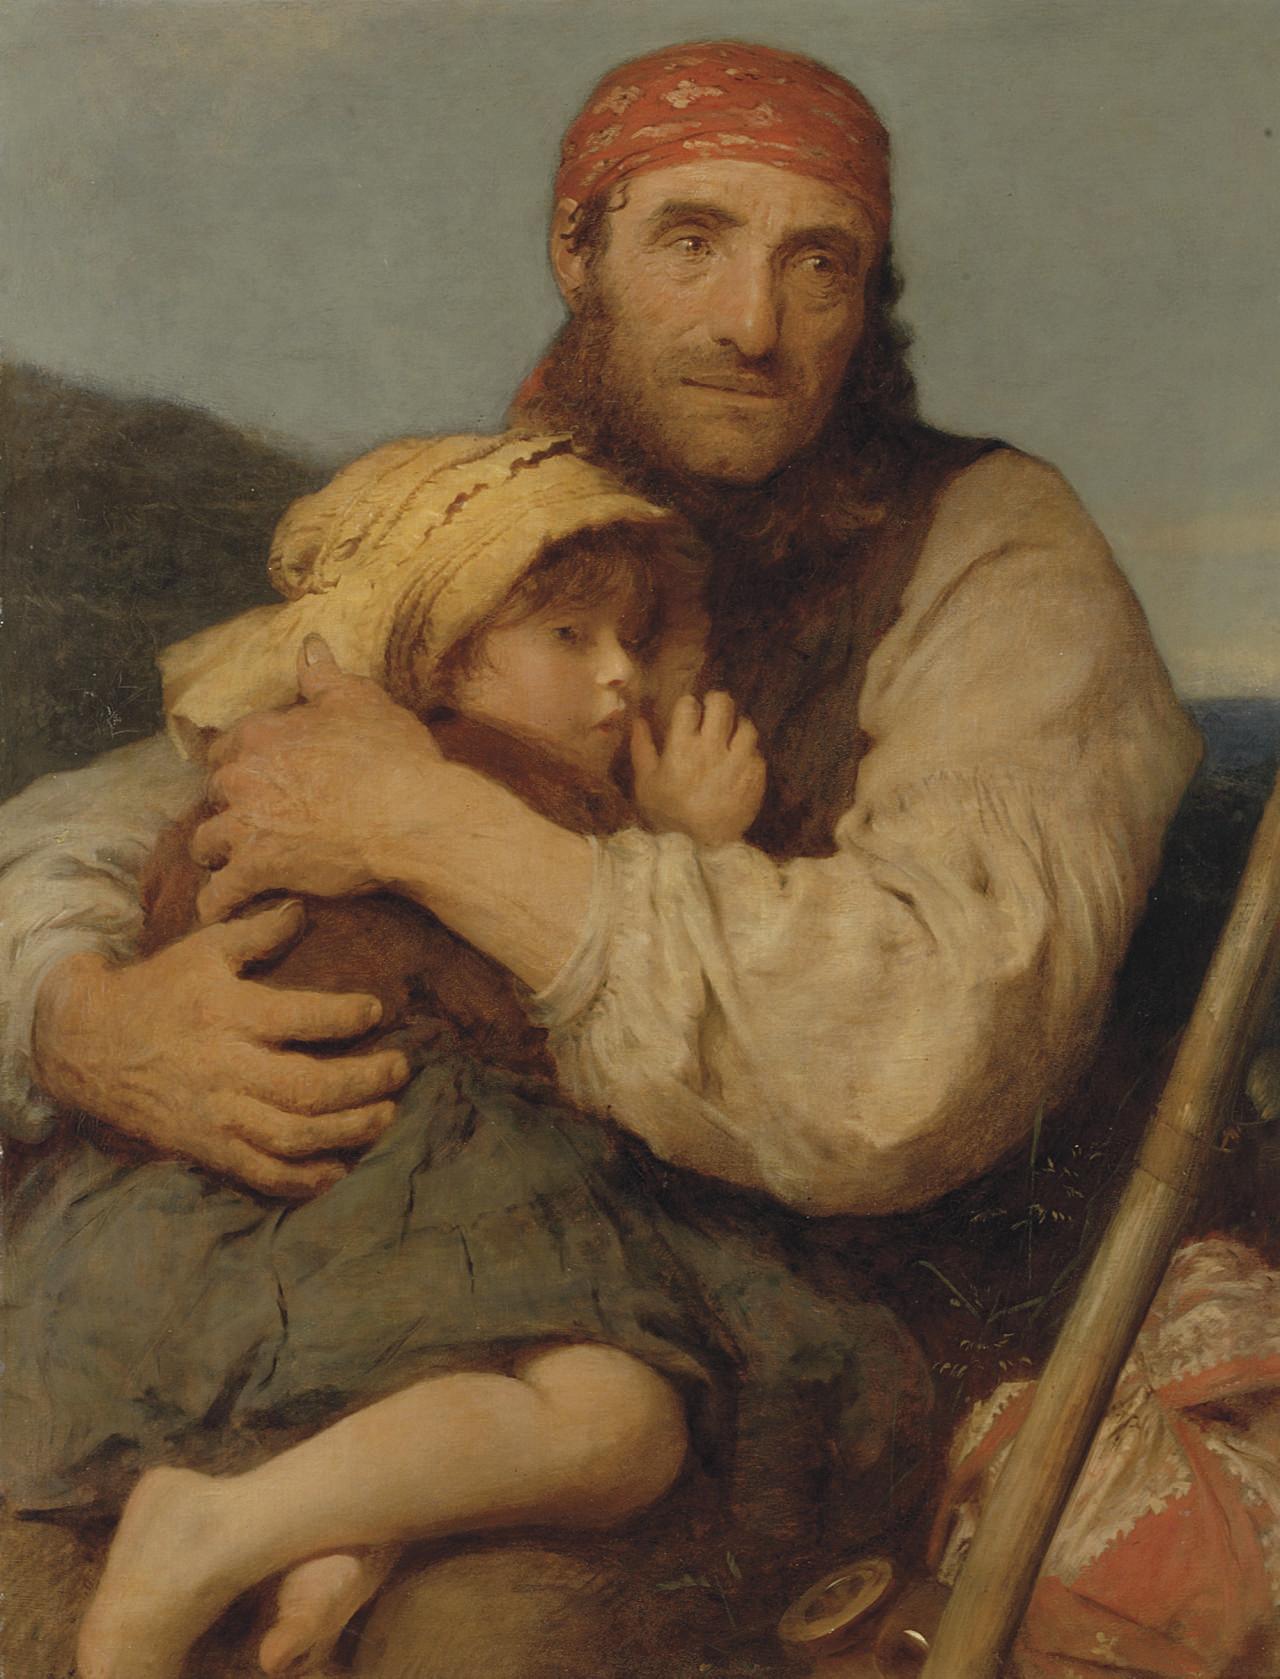 John Morgan, R.B.A. (1823-1885